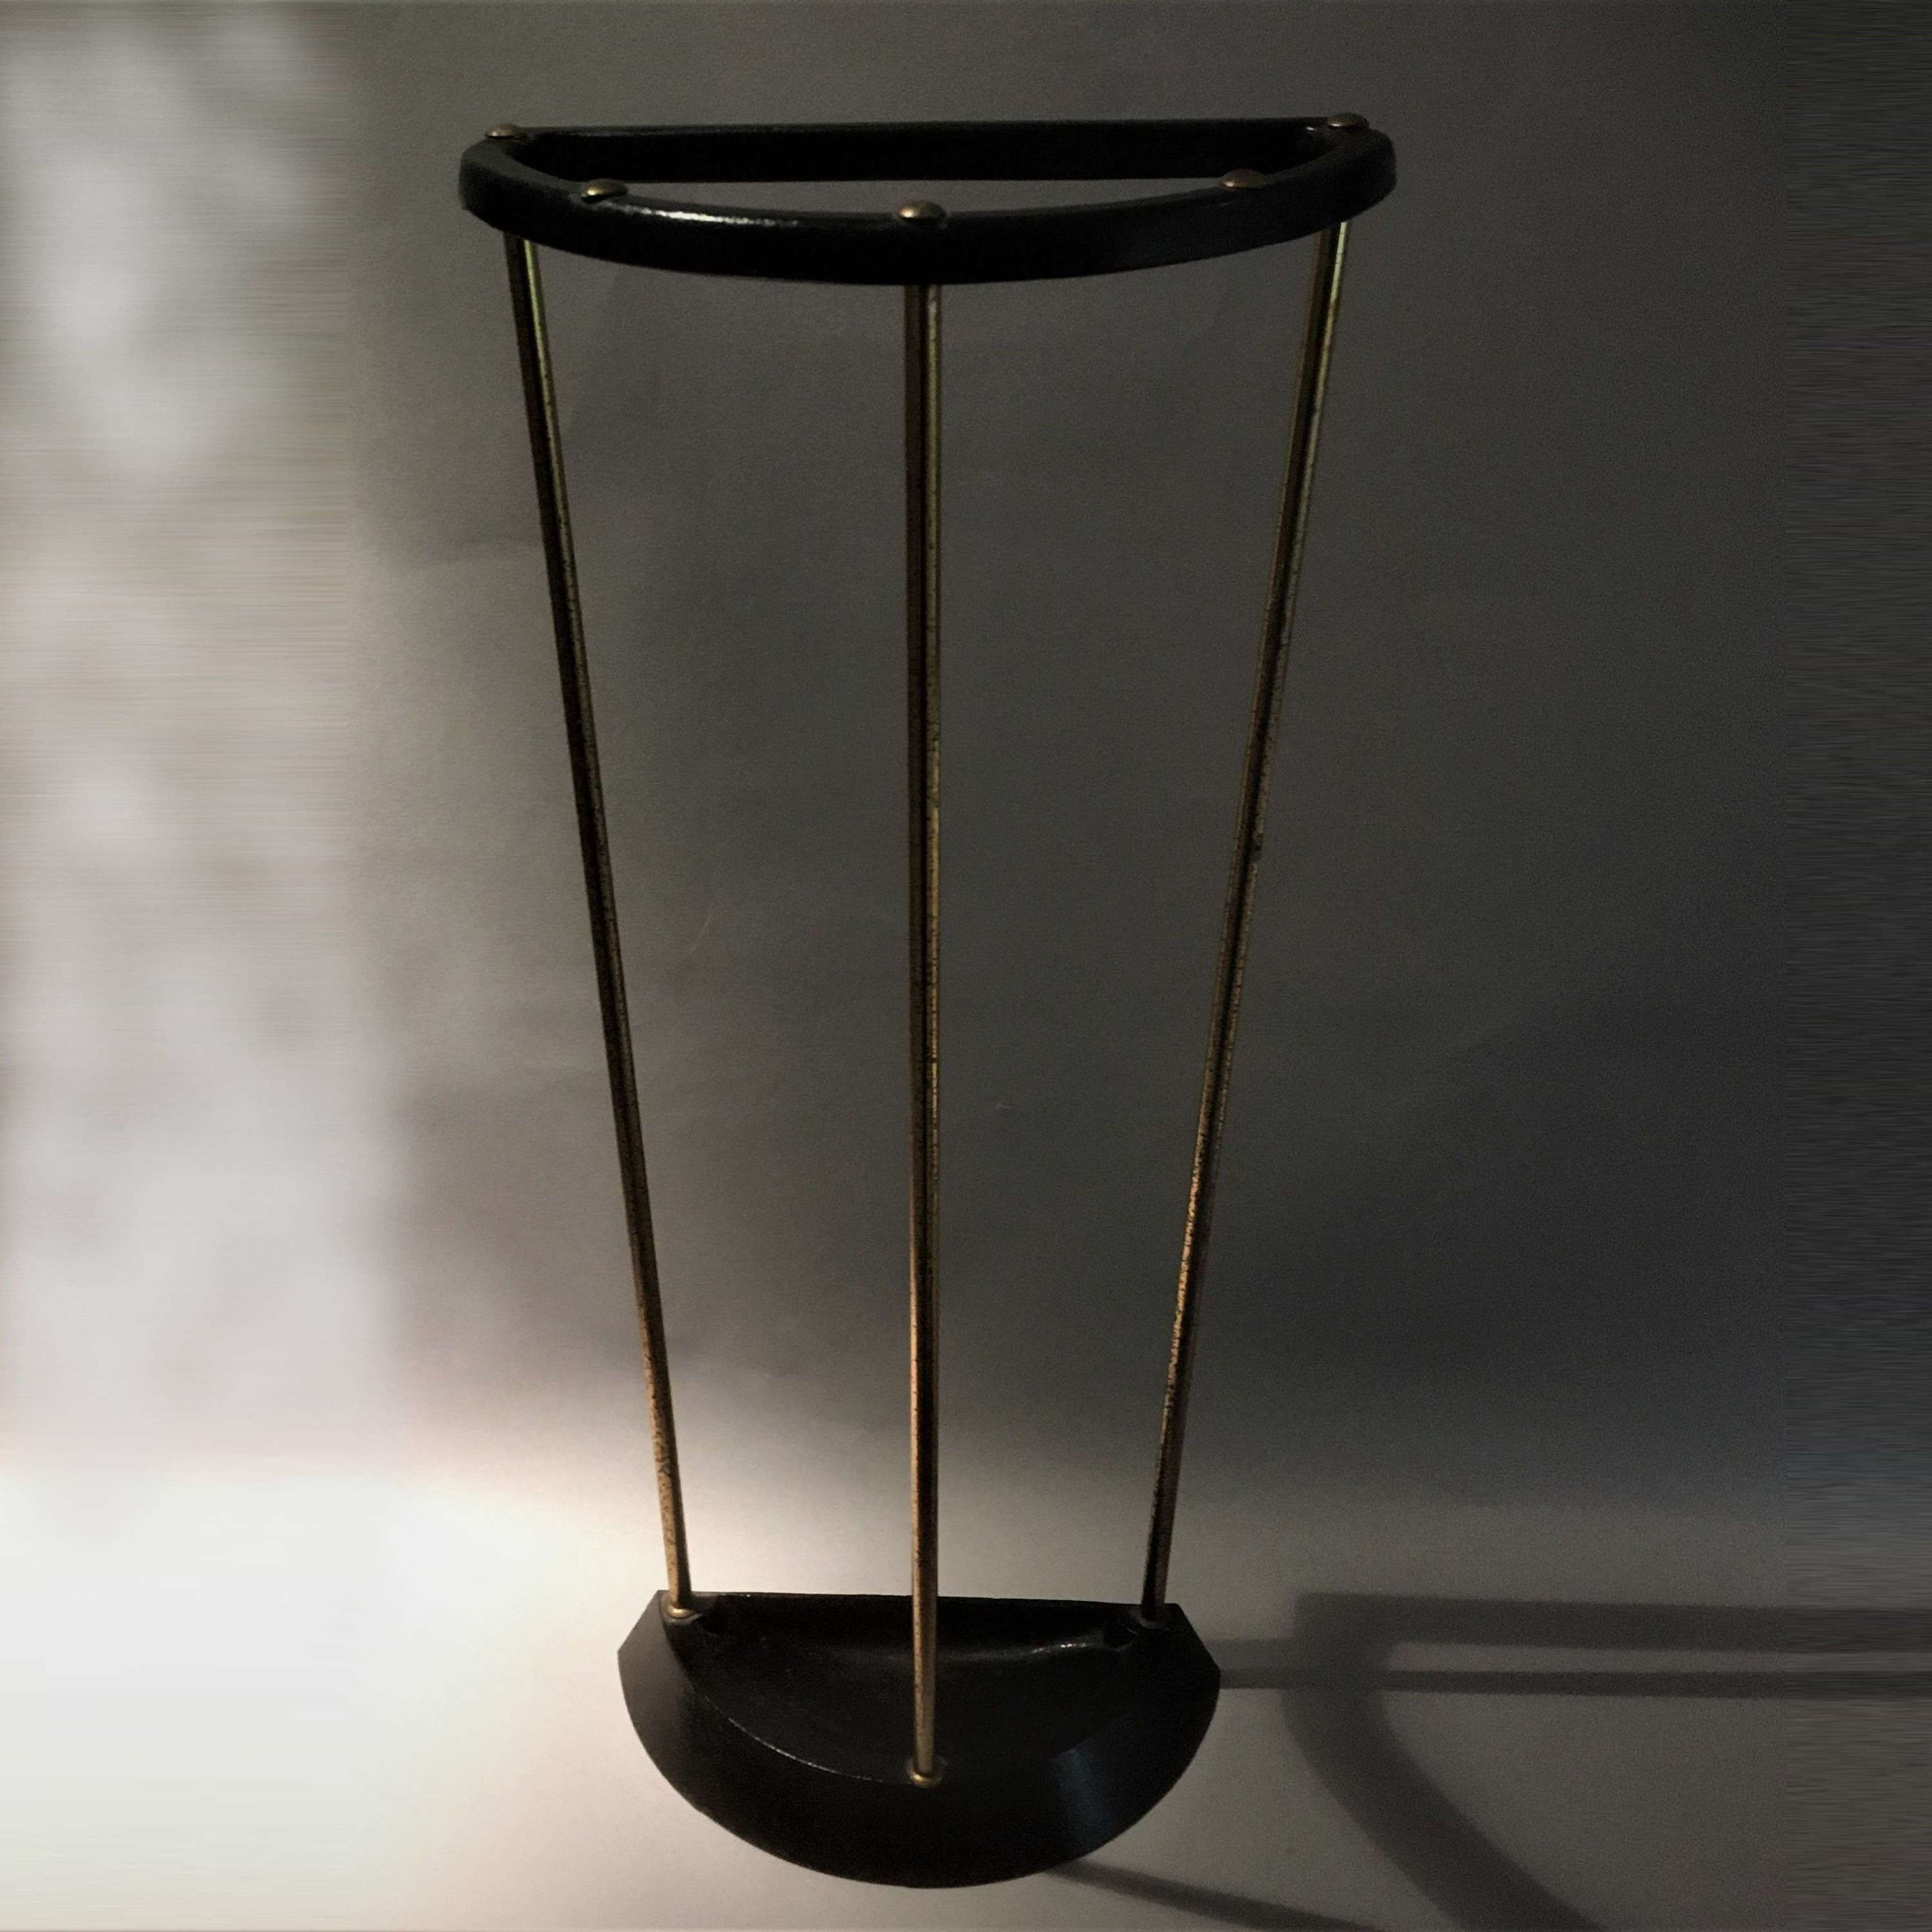 A good mid-century modern demi-lune walking stick or umbrella stand